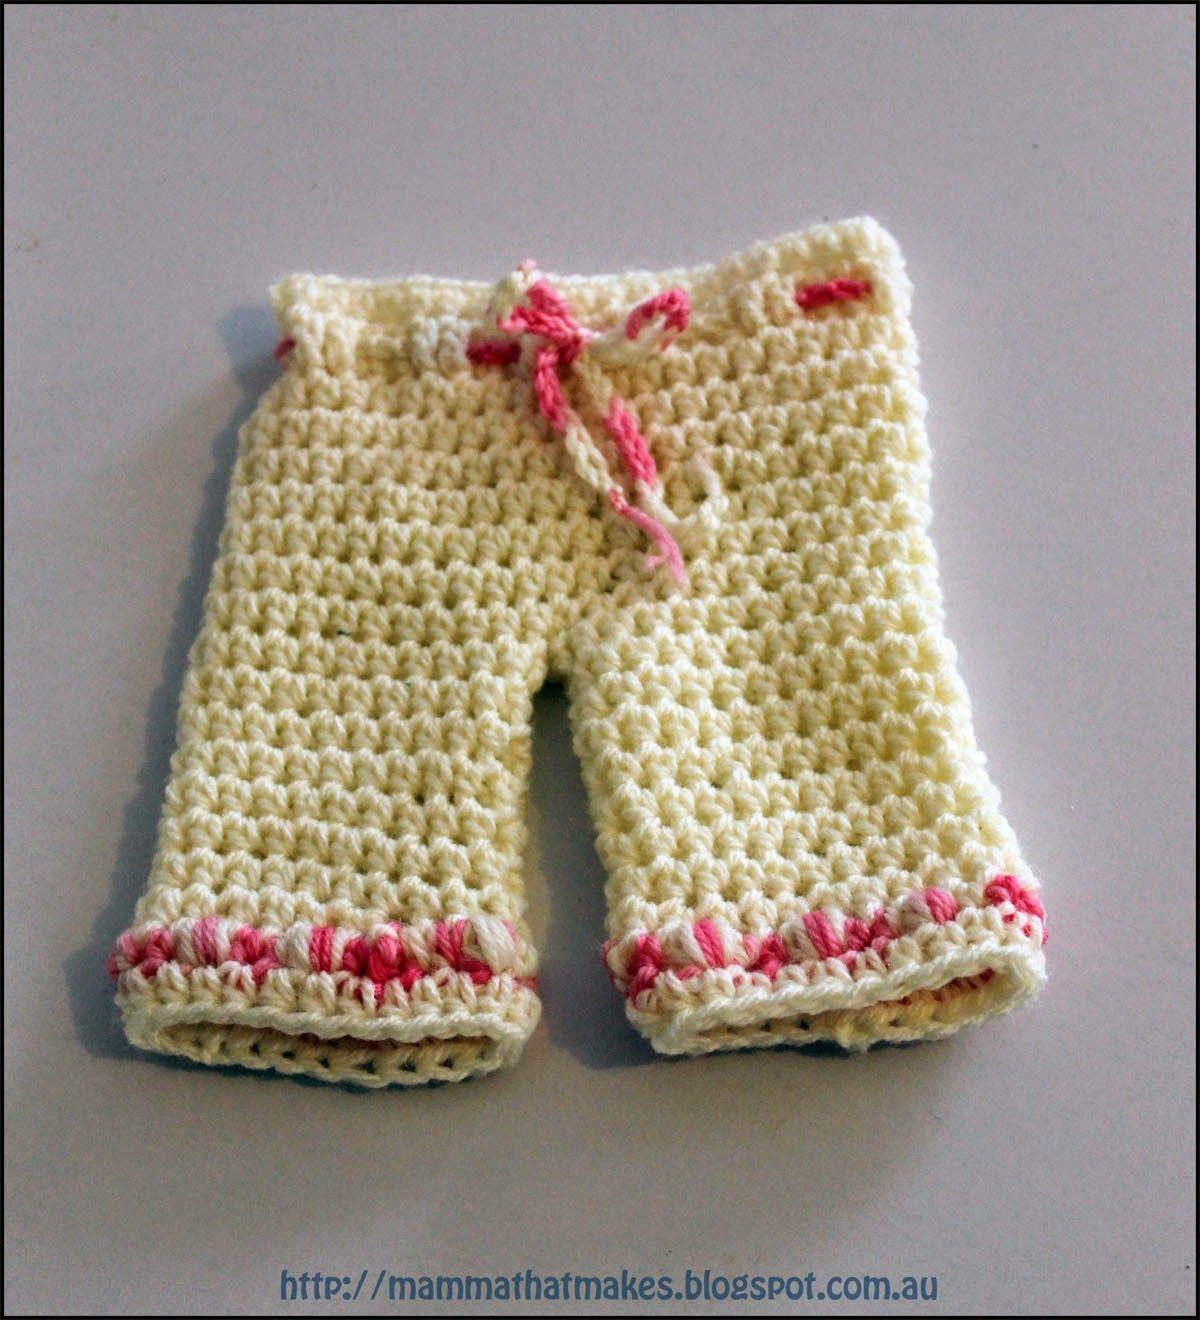 Mamma Eso hace: Pantalones de Bo - Patrón gratuito Prem ganchillo ...